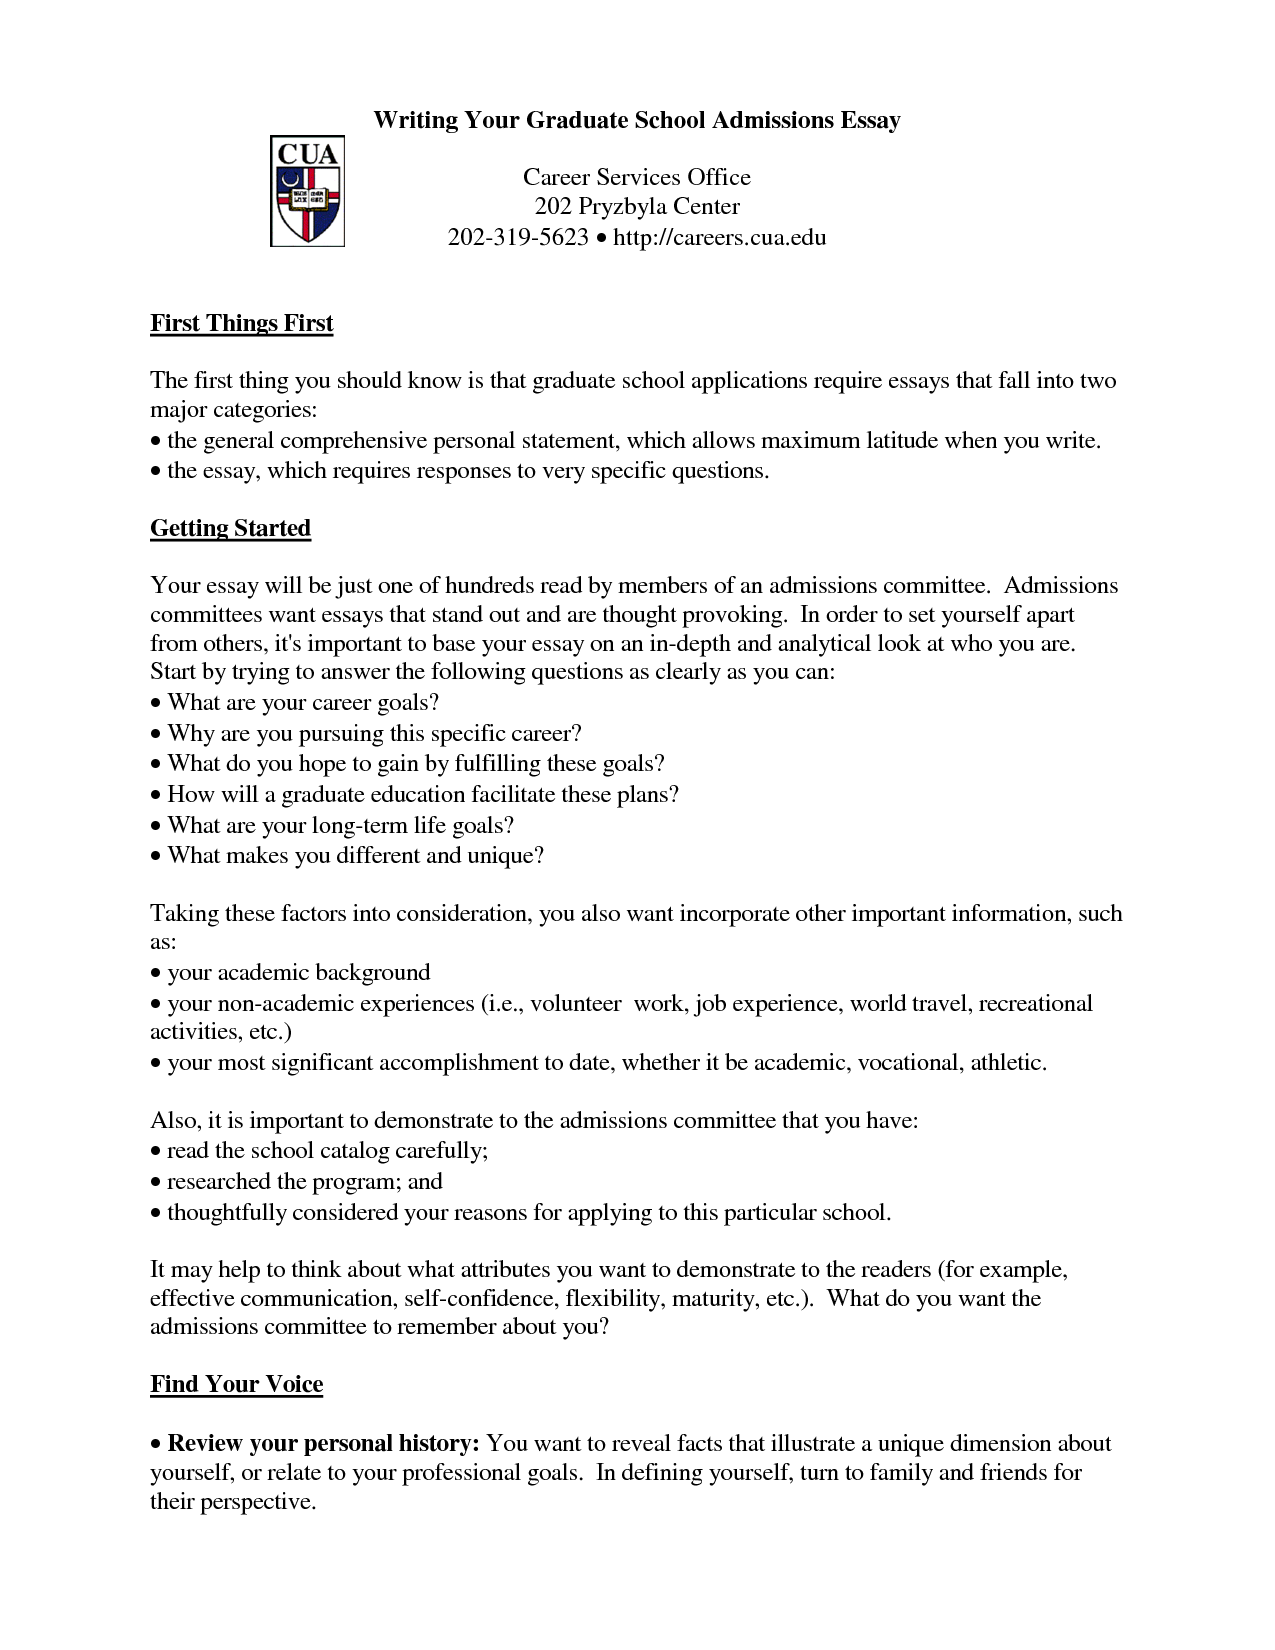 how to write a grad school application essay